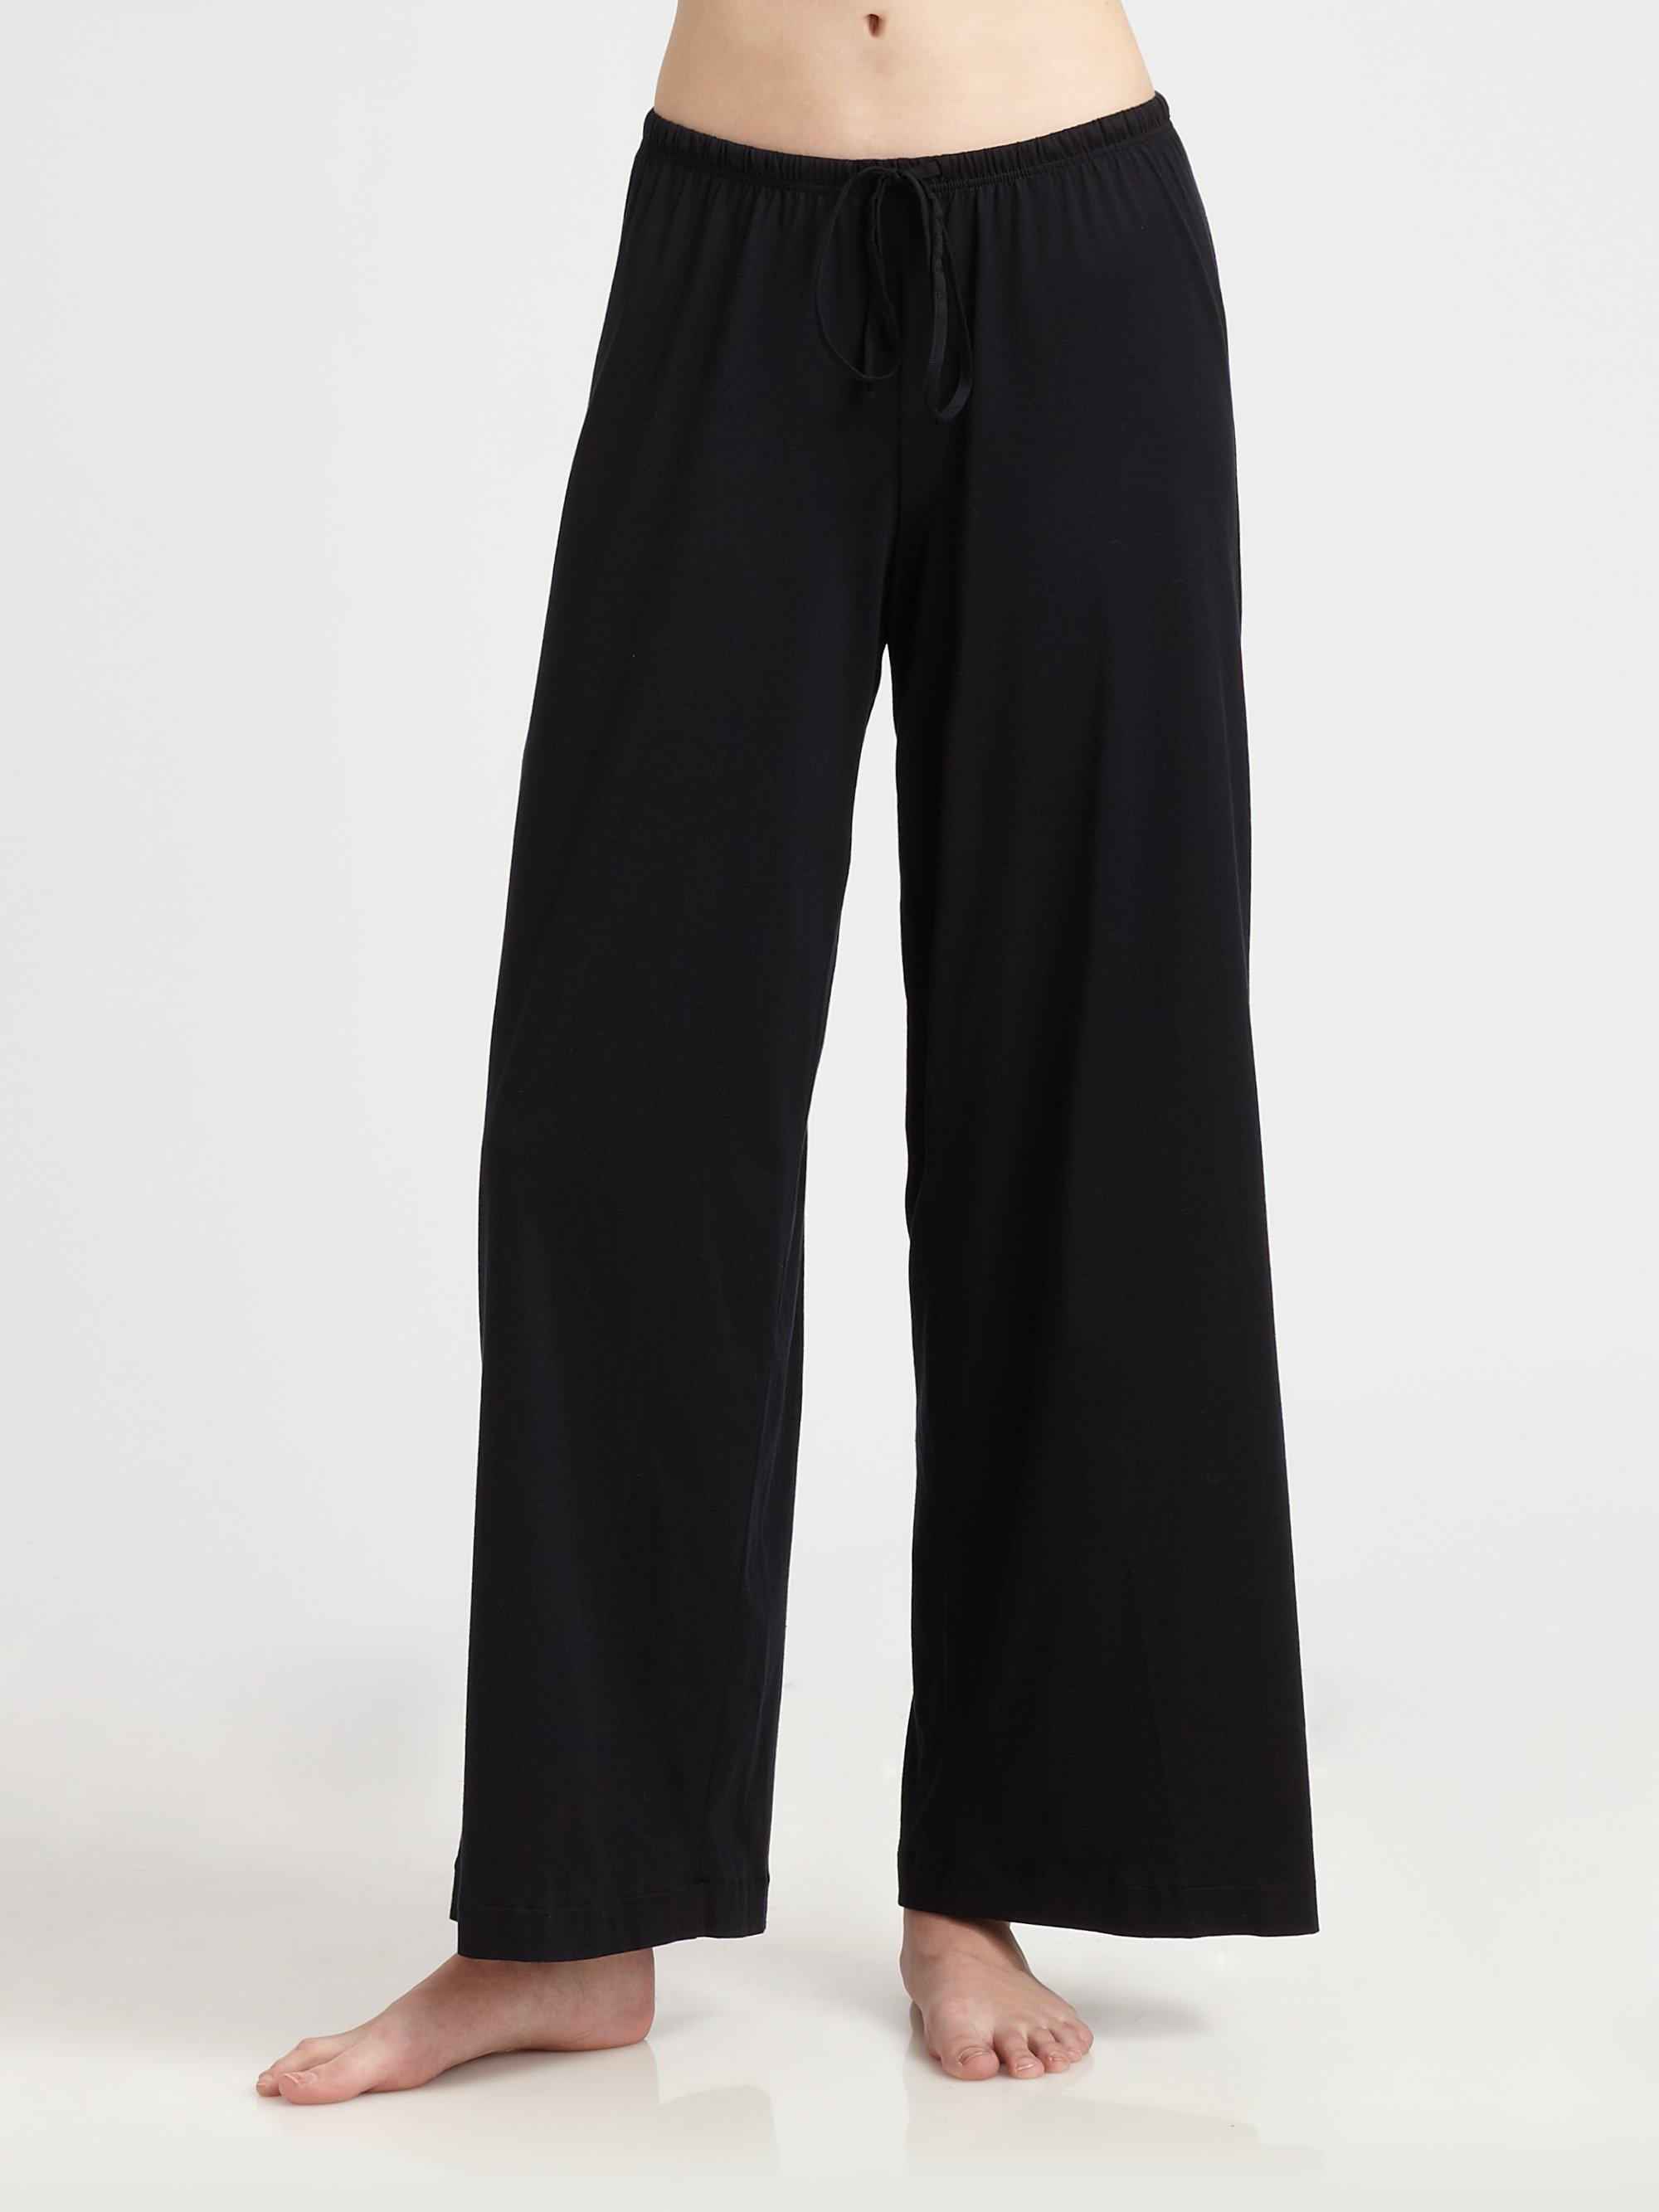 Model 26 Beautiful Cotton Slacks Womens Pants U2013 Playzoa.com